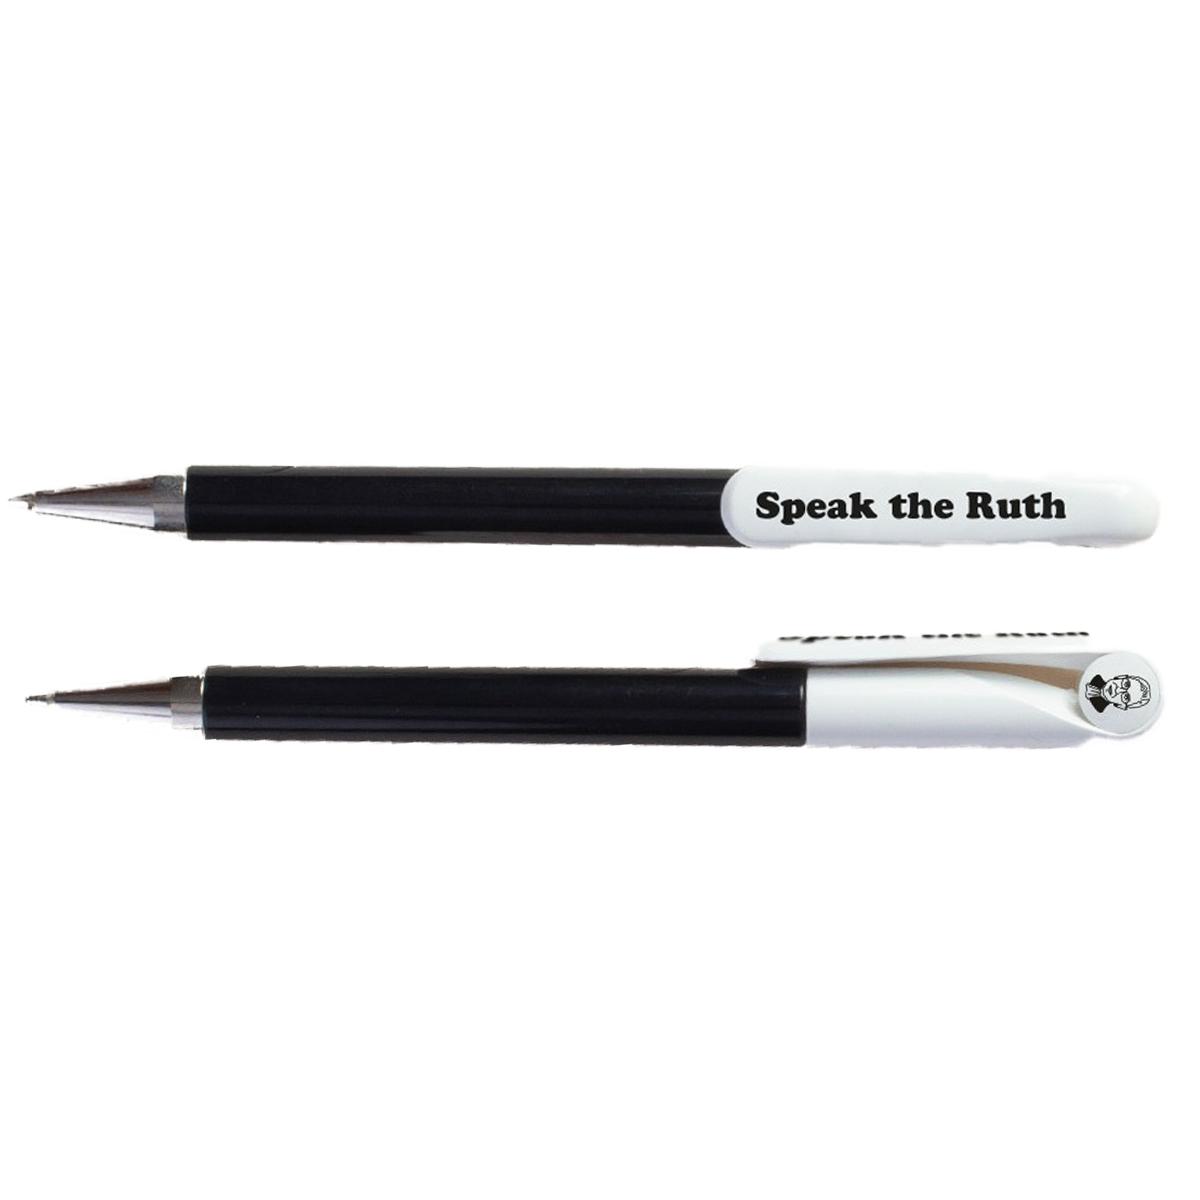 image of RBG seven year pen